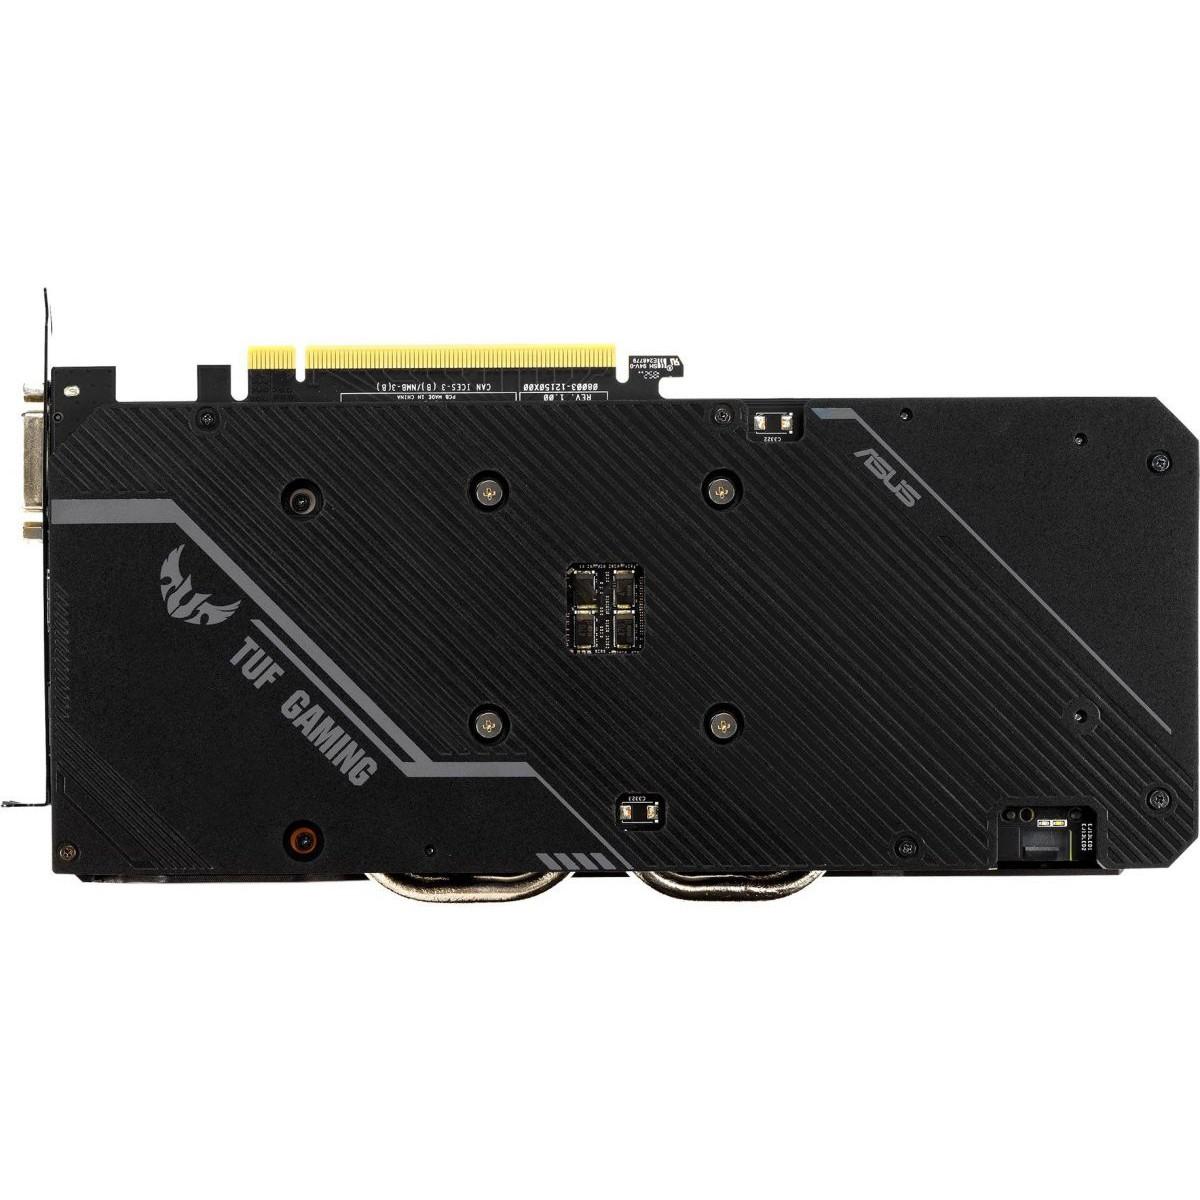 Placa de Vídeo Asus GeForce TUF3 GTX 1660 OC, 6GB GDDR5, 192Bit, TUF3-GTX1660-O6G-GAMING